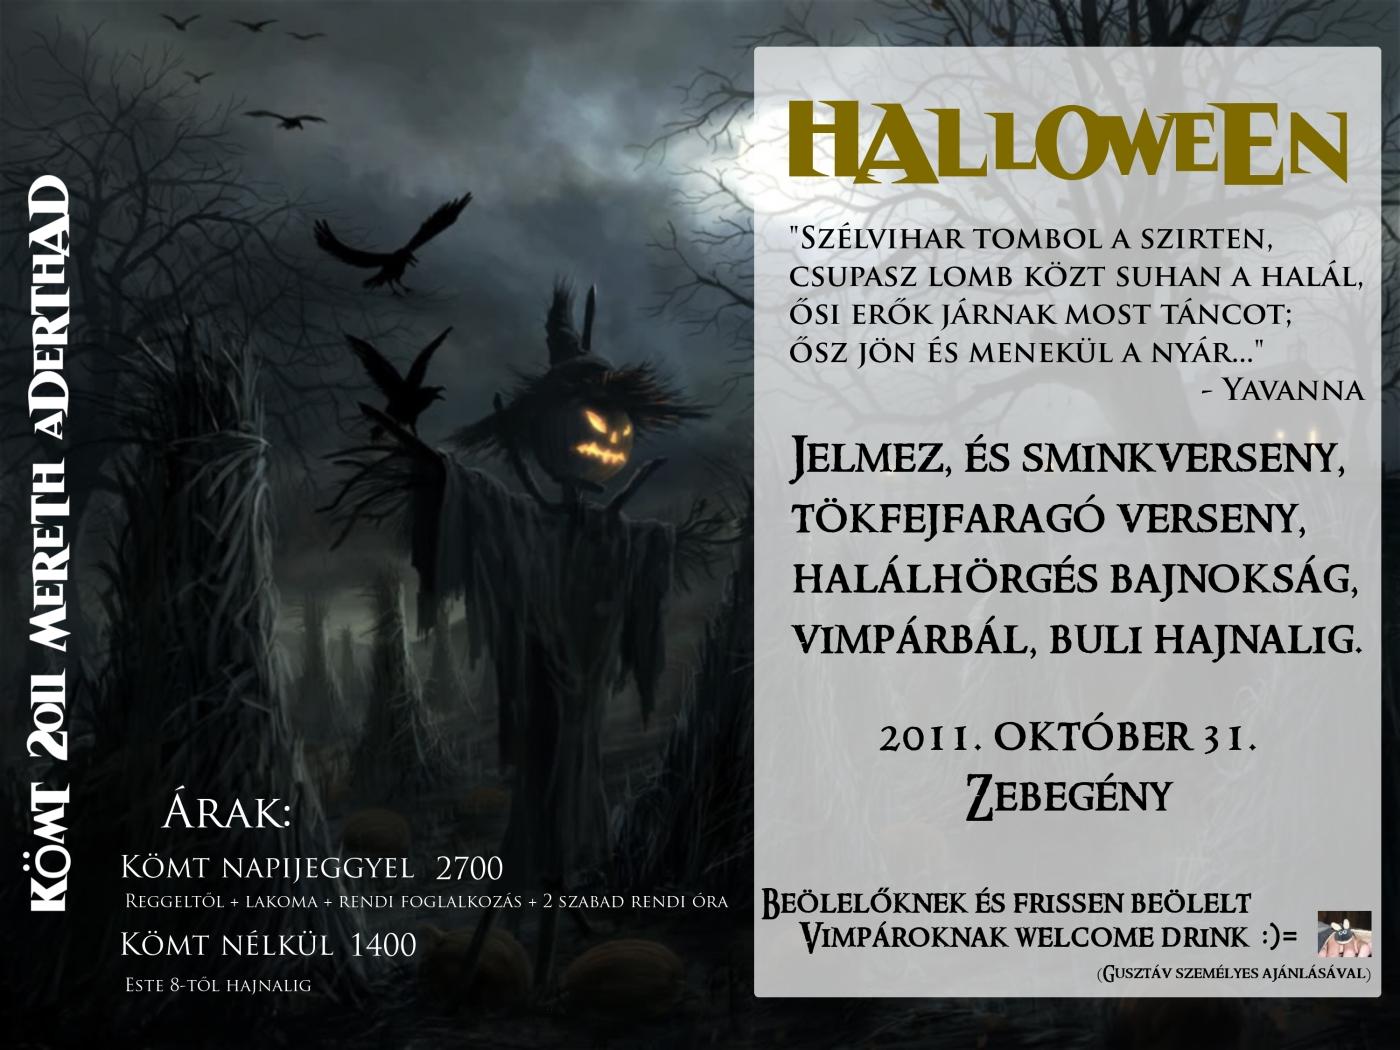 Halloween_plakat_1400.jpg